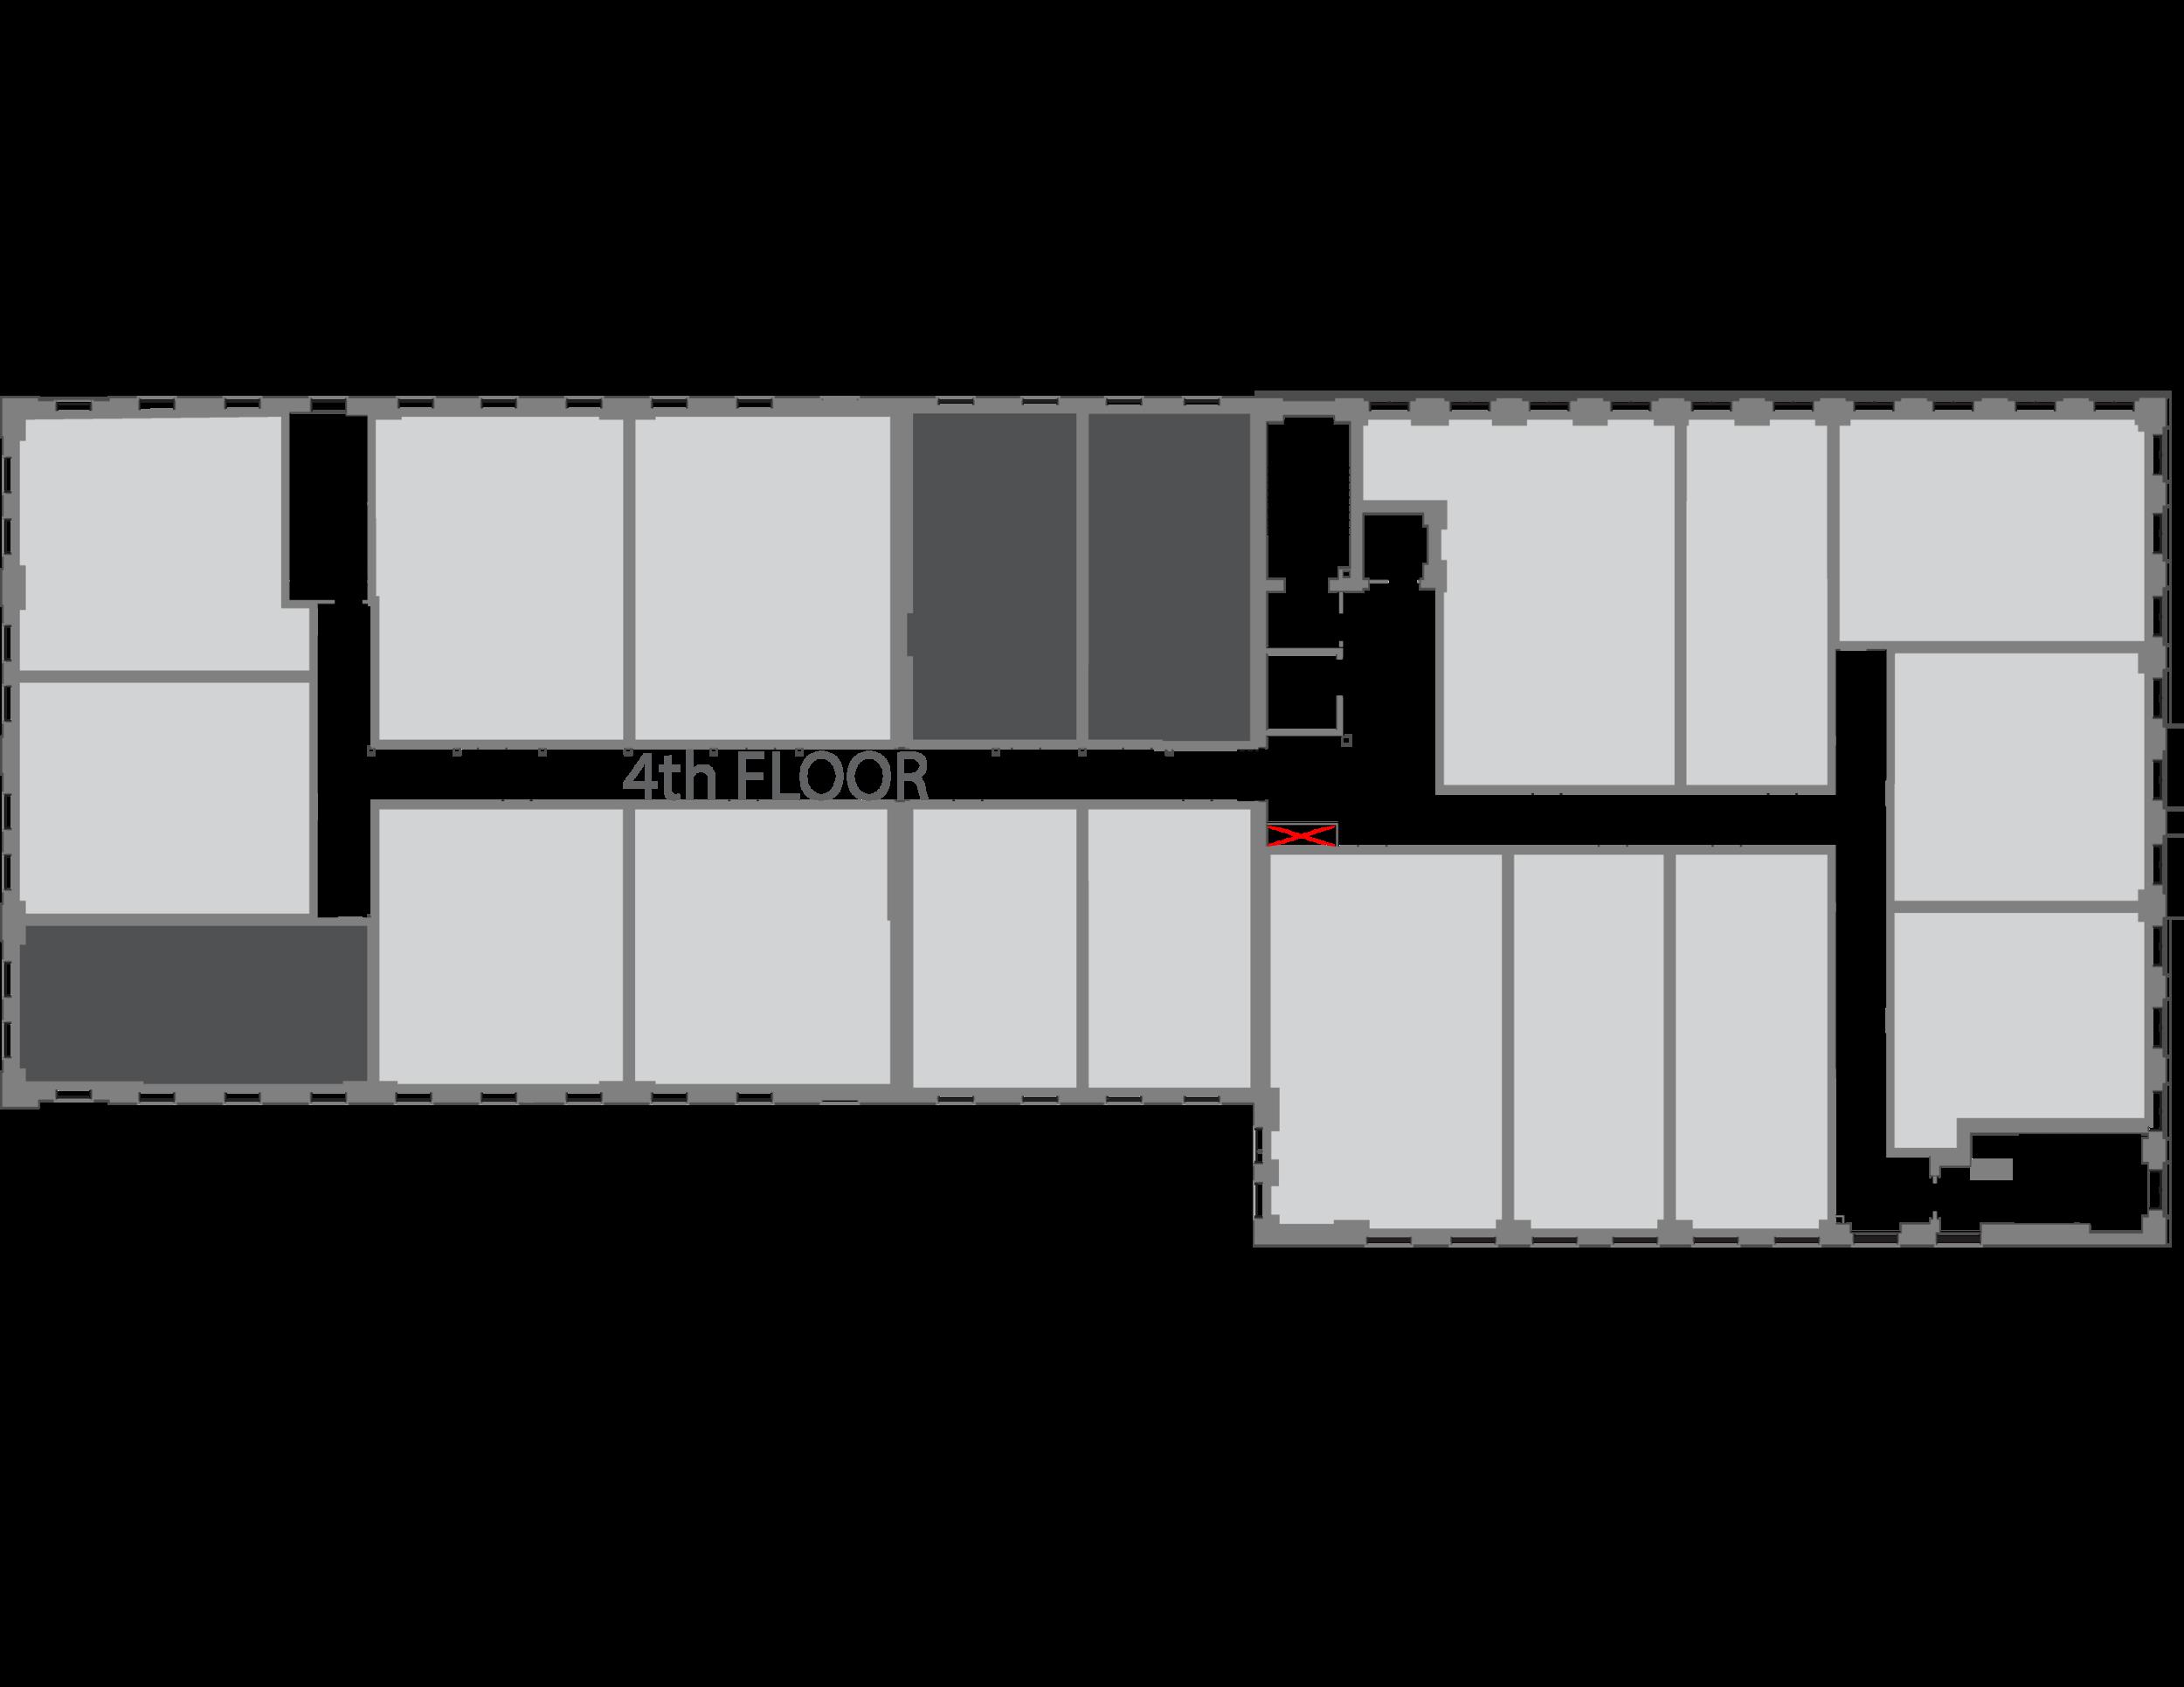 Doyle_plan  SCREWDRIVER_4TH FLOOR.png